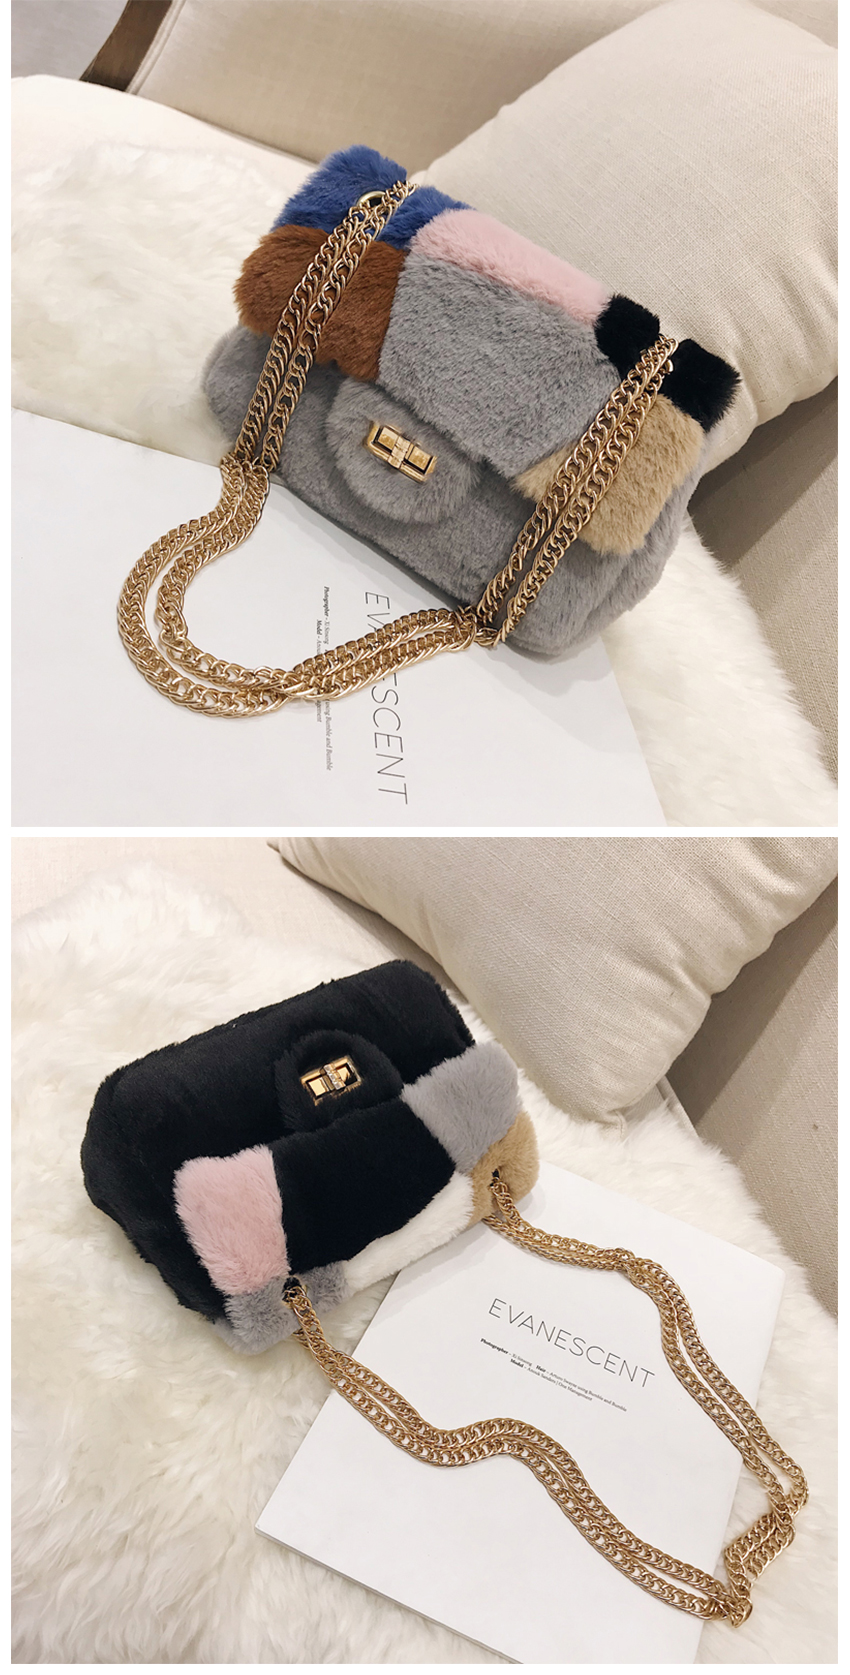 332c1fdb1f13 Patchwork Fabric Flannel Bag Like Pig Chains Shoulder Bags Female ...